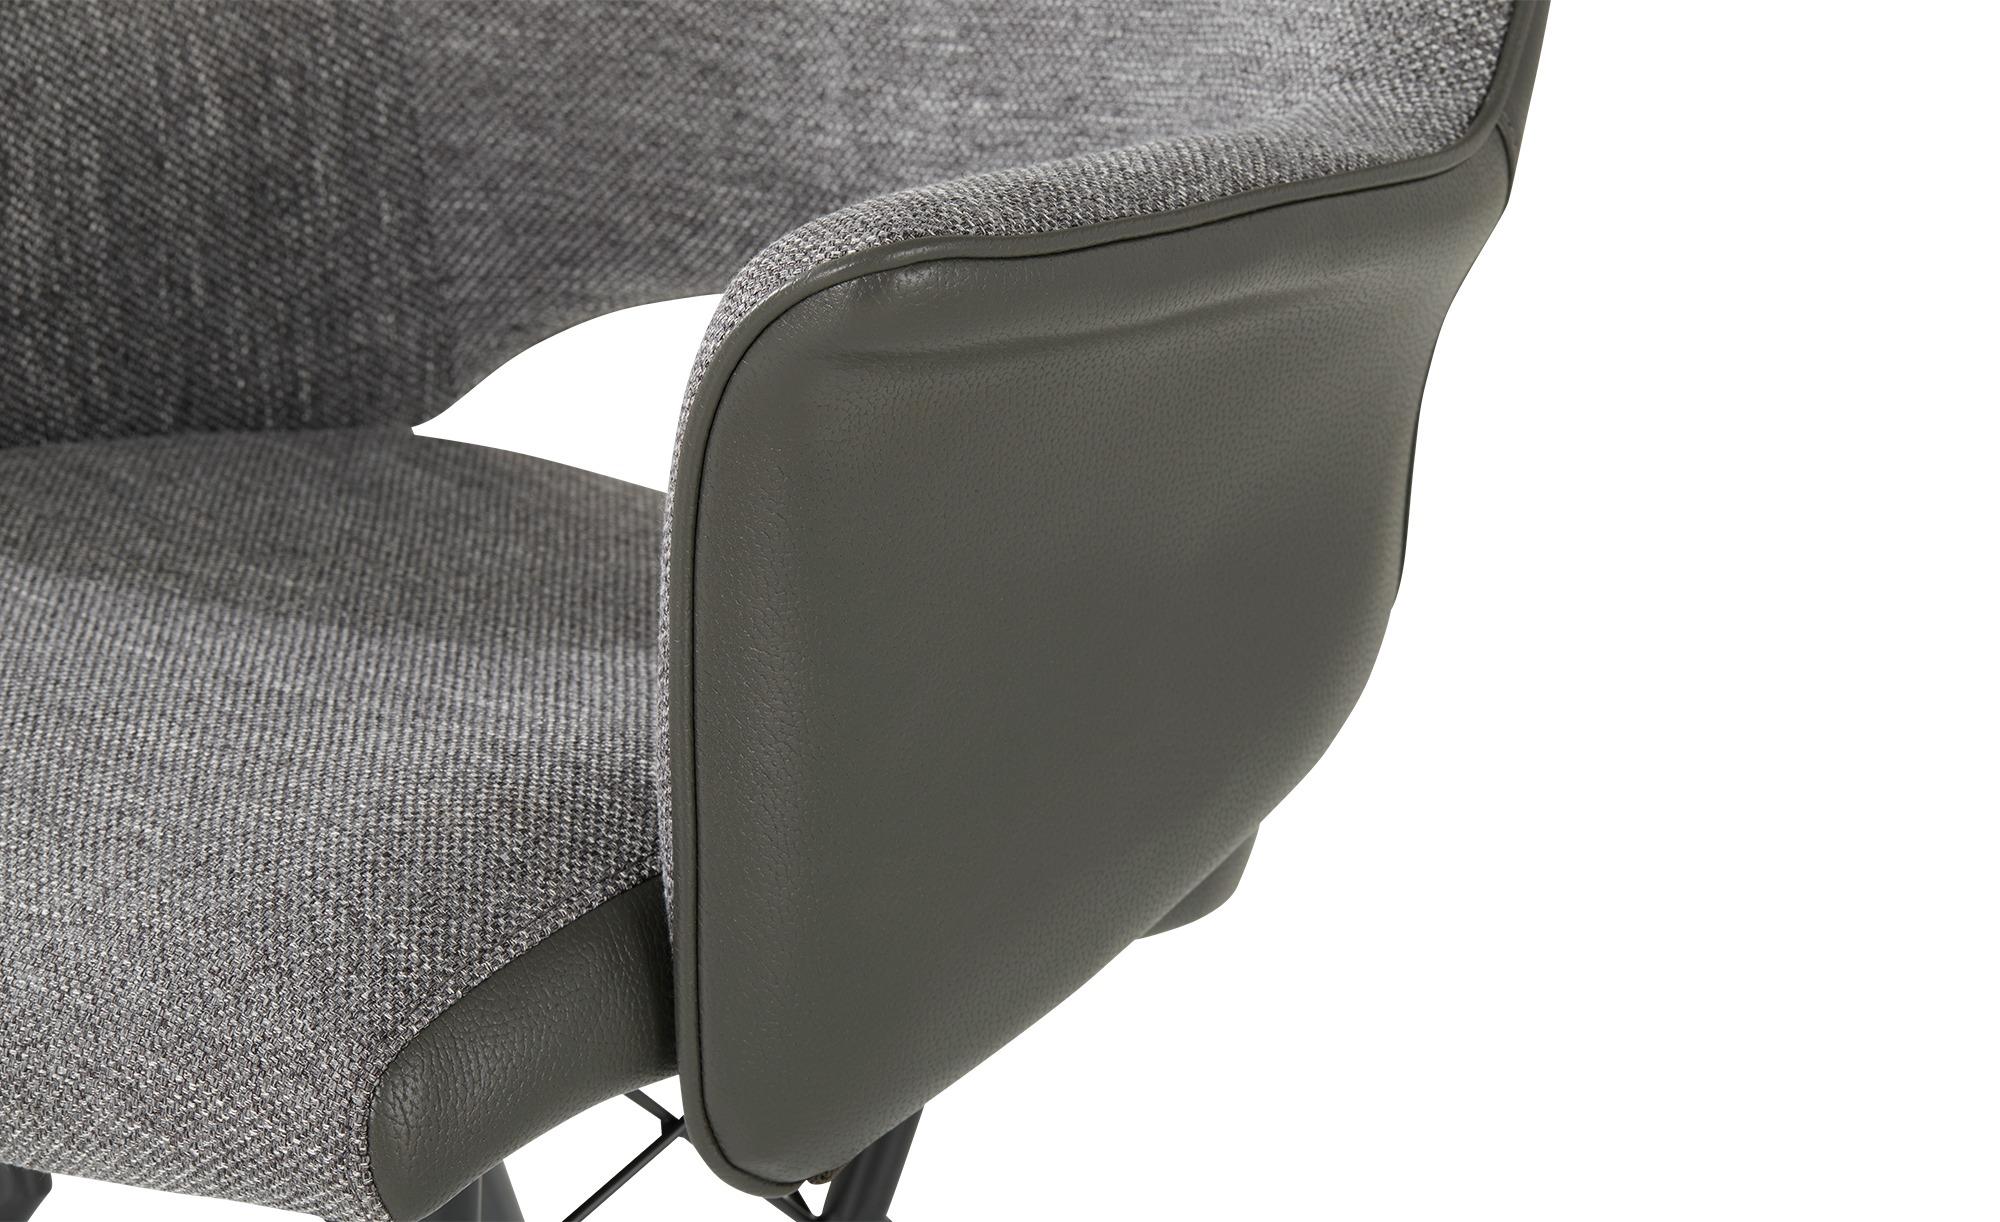 uno Sessel  Vineo ¦ grau ¦ Maße (cm): B: 63 H: 86,5 T: 66 Stühle > Esszimmerstühle > Esszimmerstühle mit Armlehnen - Höffner